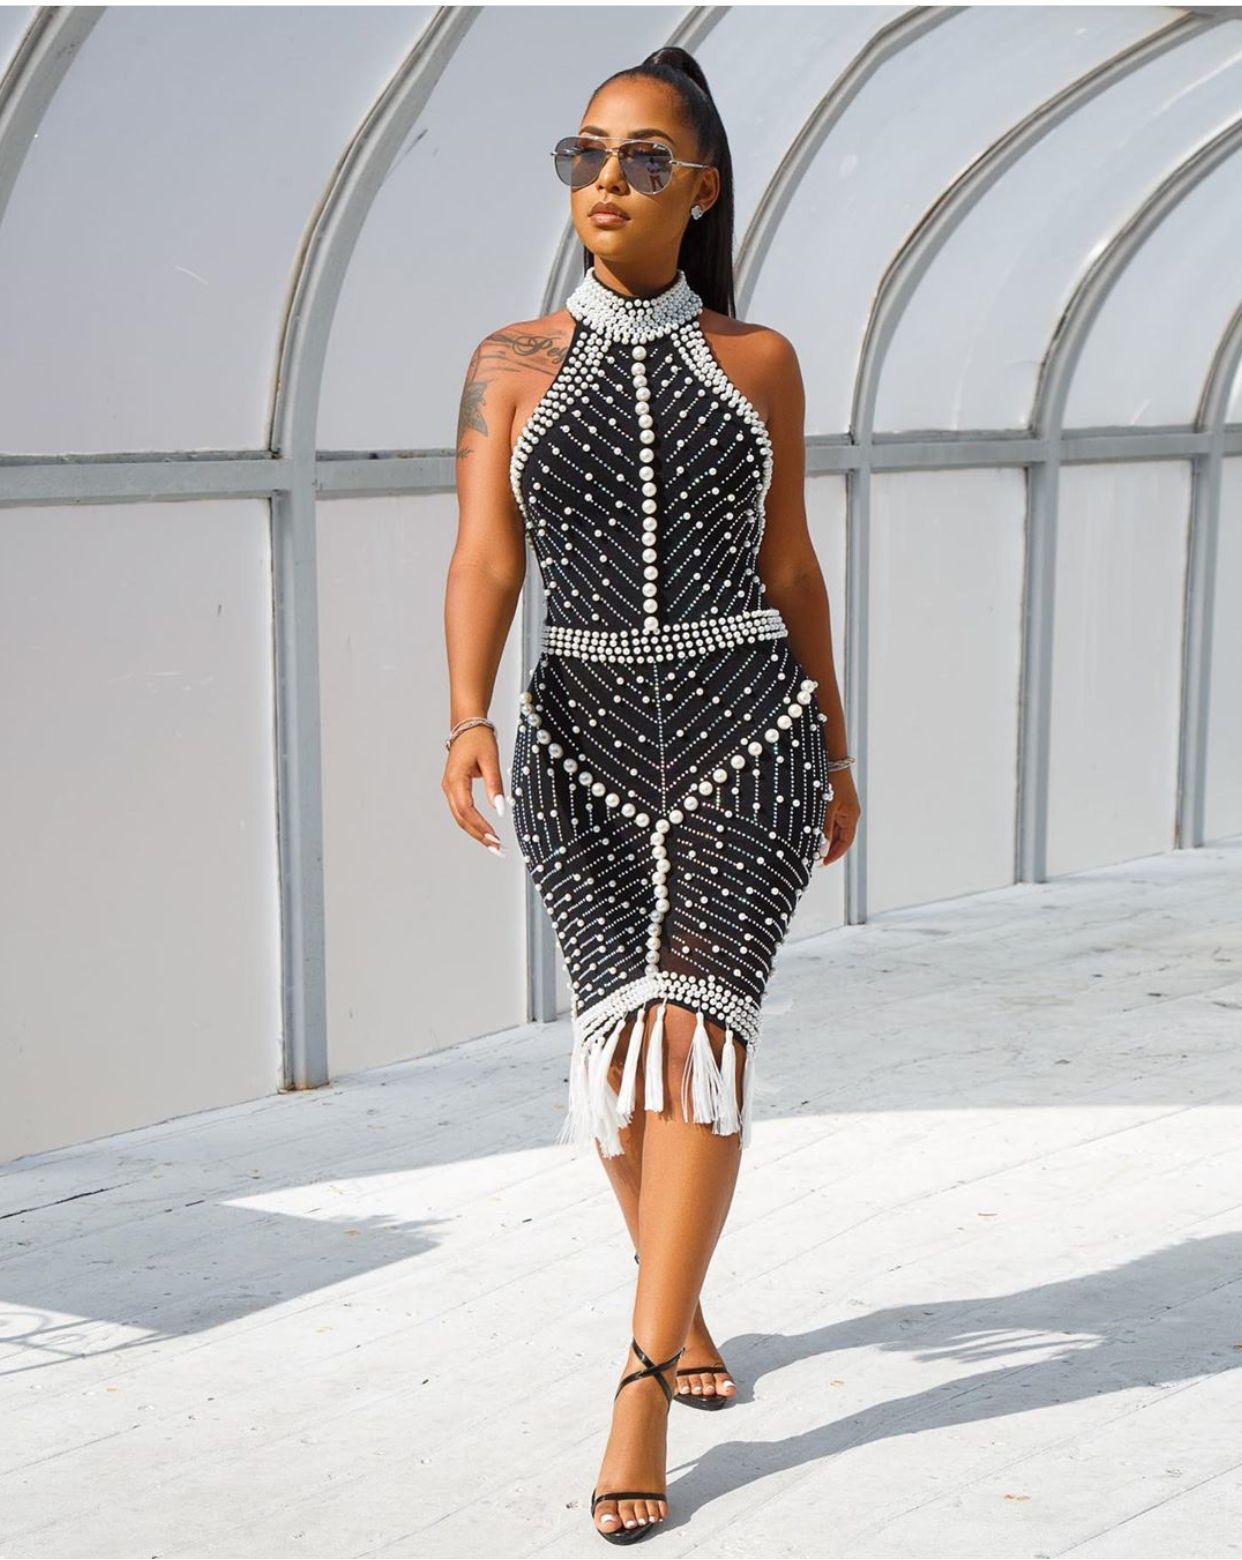 2019 New Arrival Autumn Fashion Style African Women Beauty Plus Size Dress